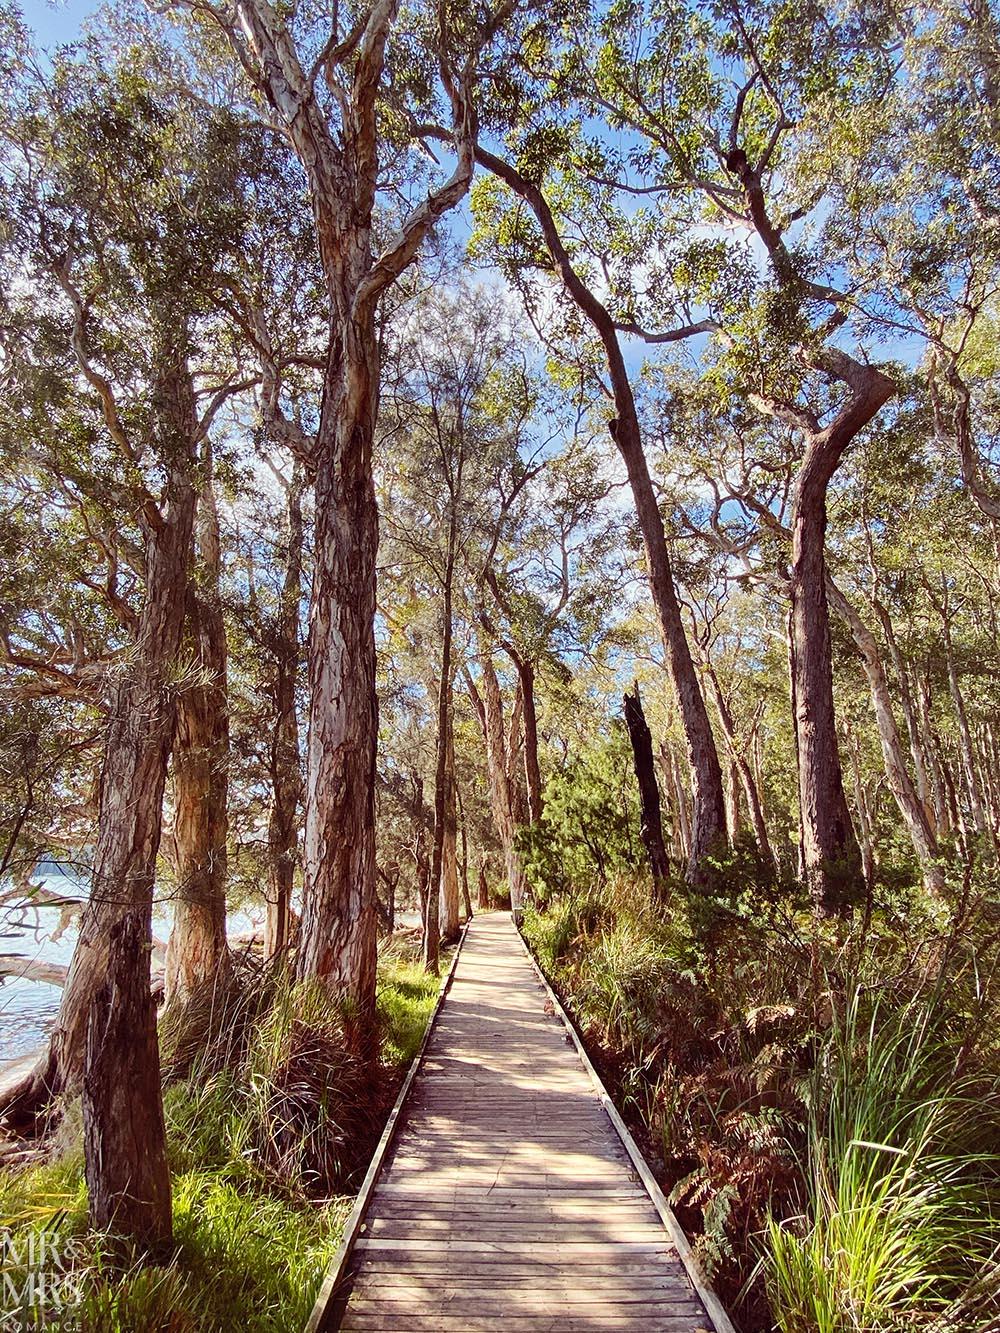 Tanilba Bay Boardwalk, Lemon Tree Passage